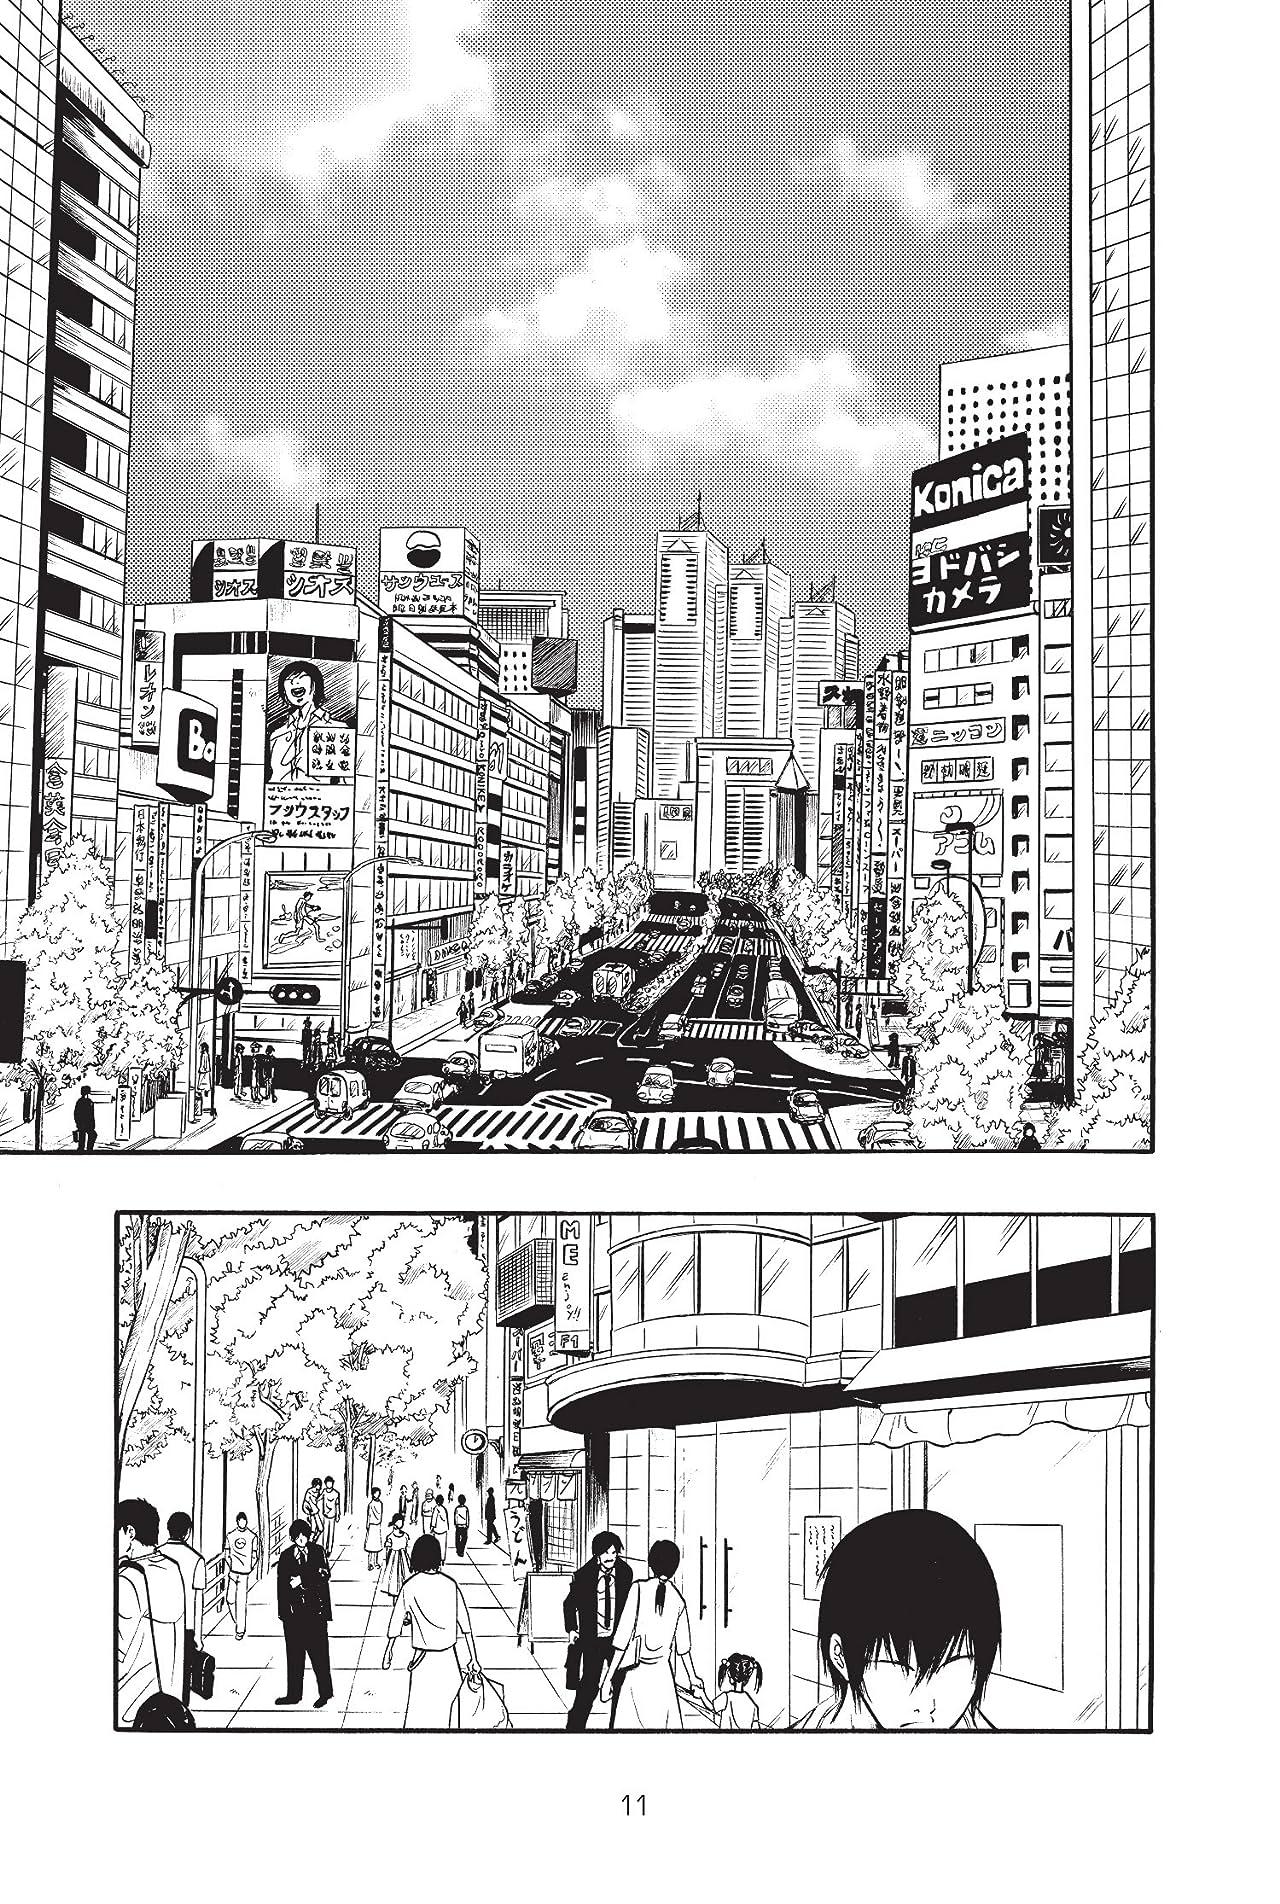 Yonen Buzz Vol. 2